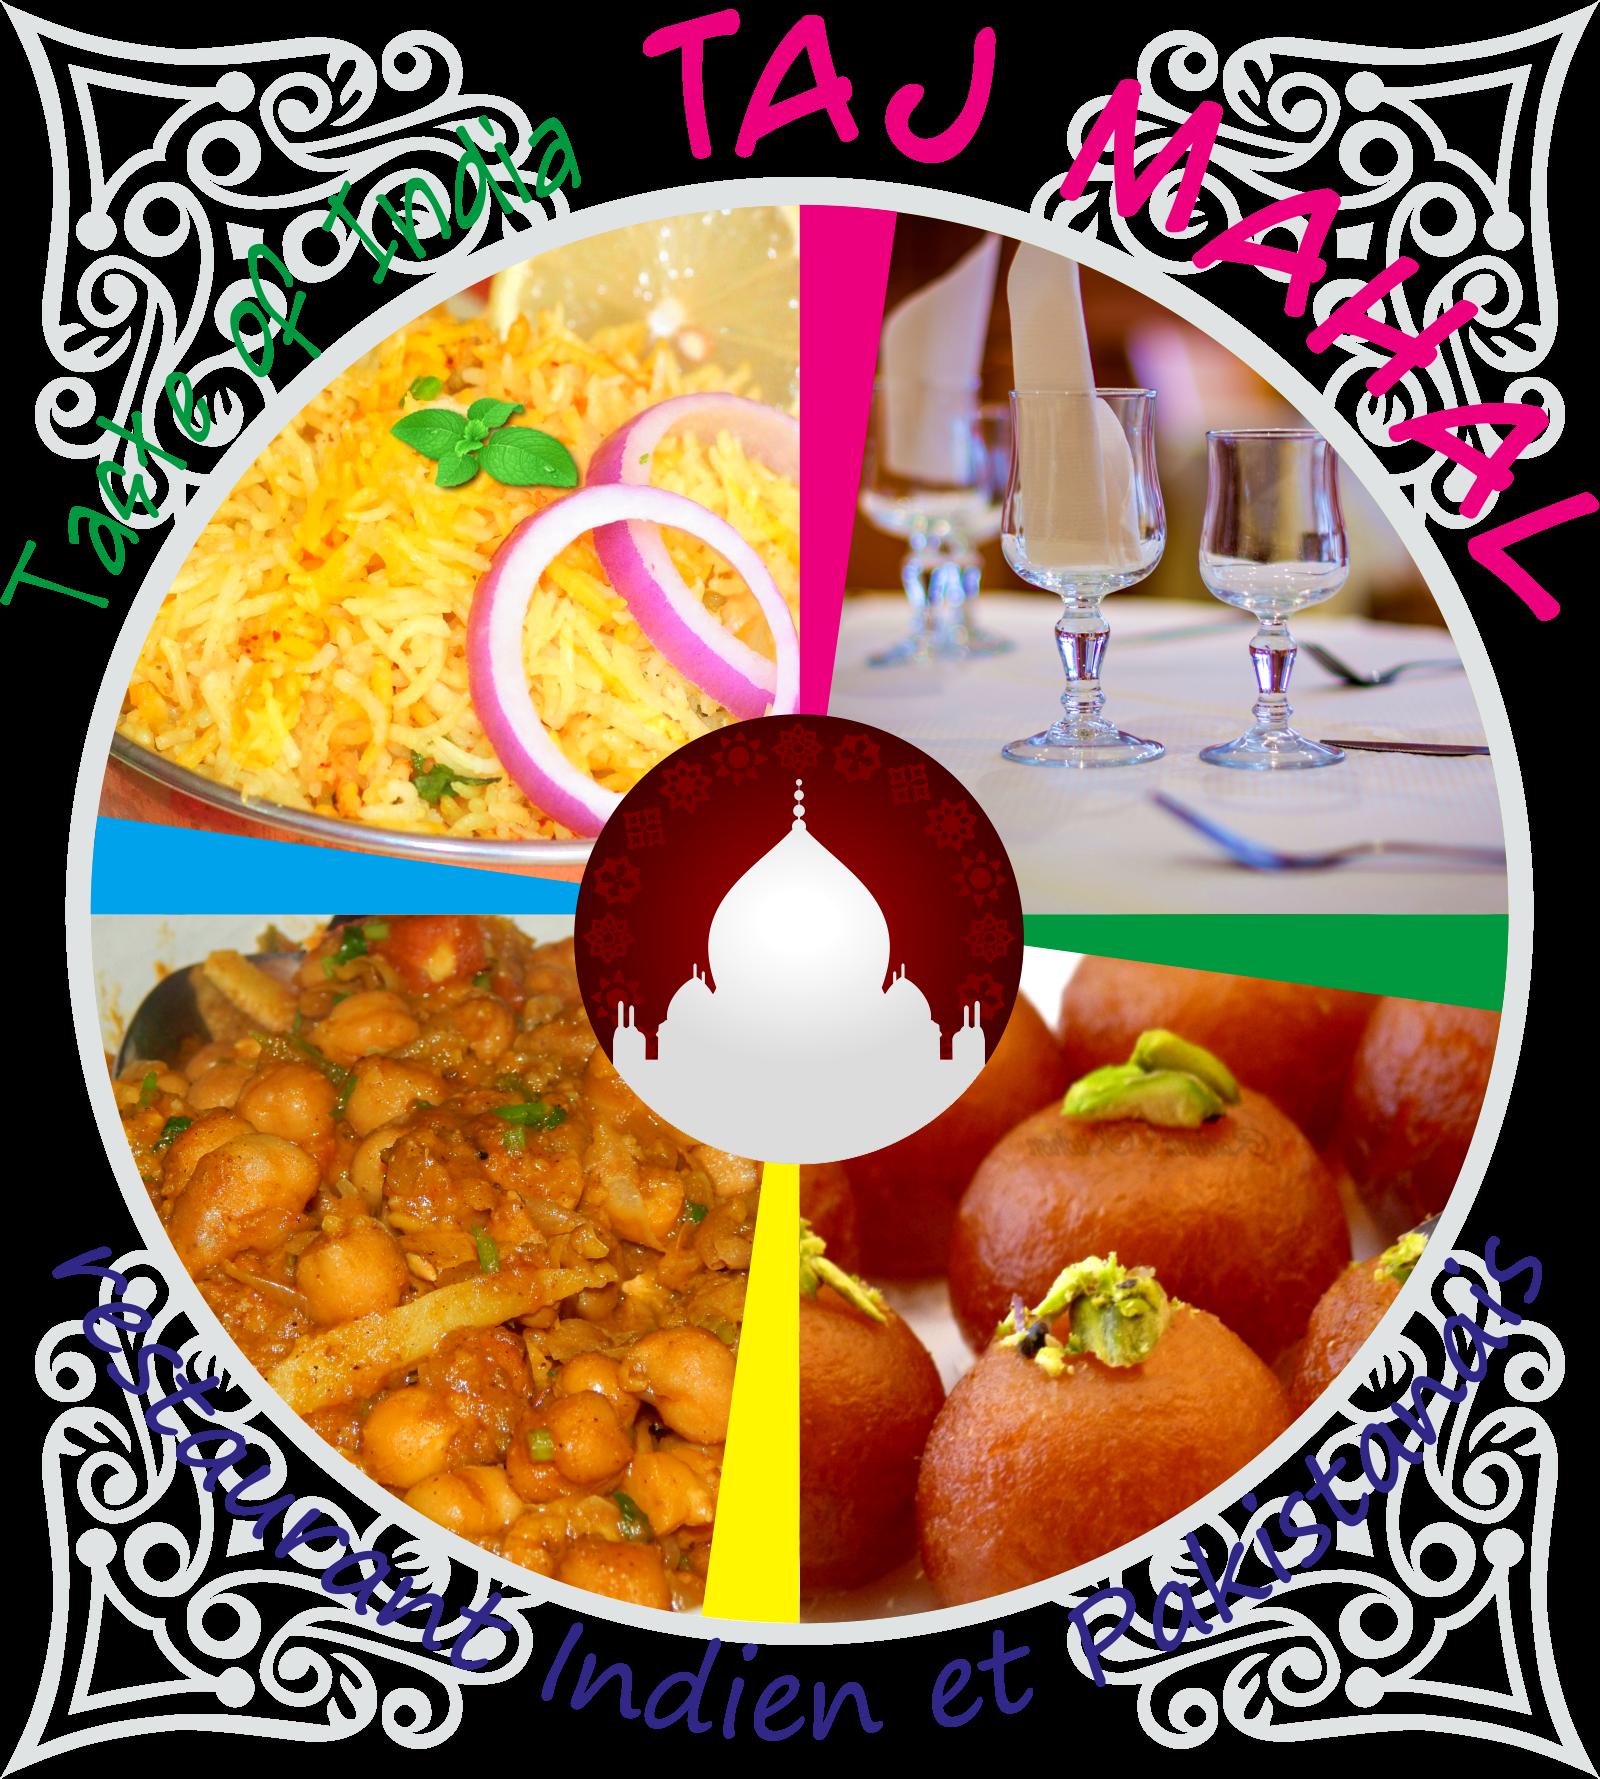 Taj Mahal restaurant indien et pakistanais